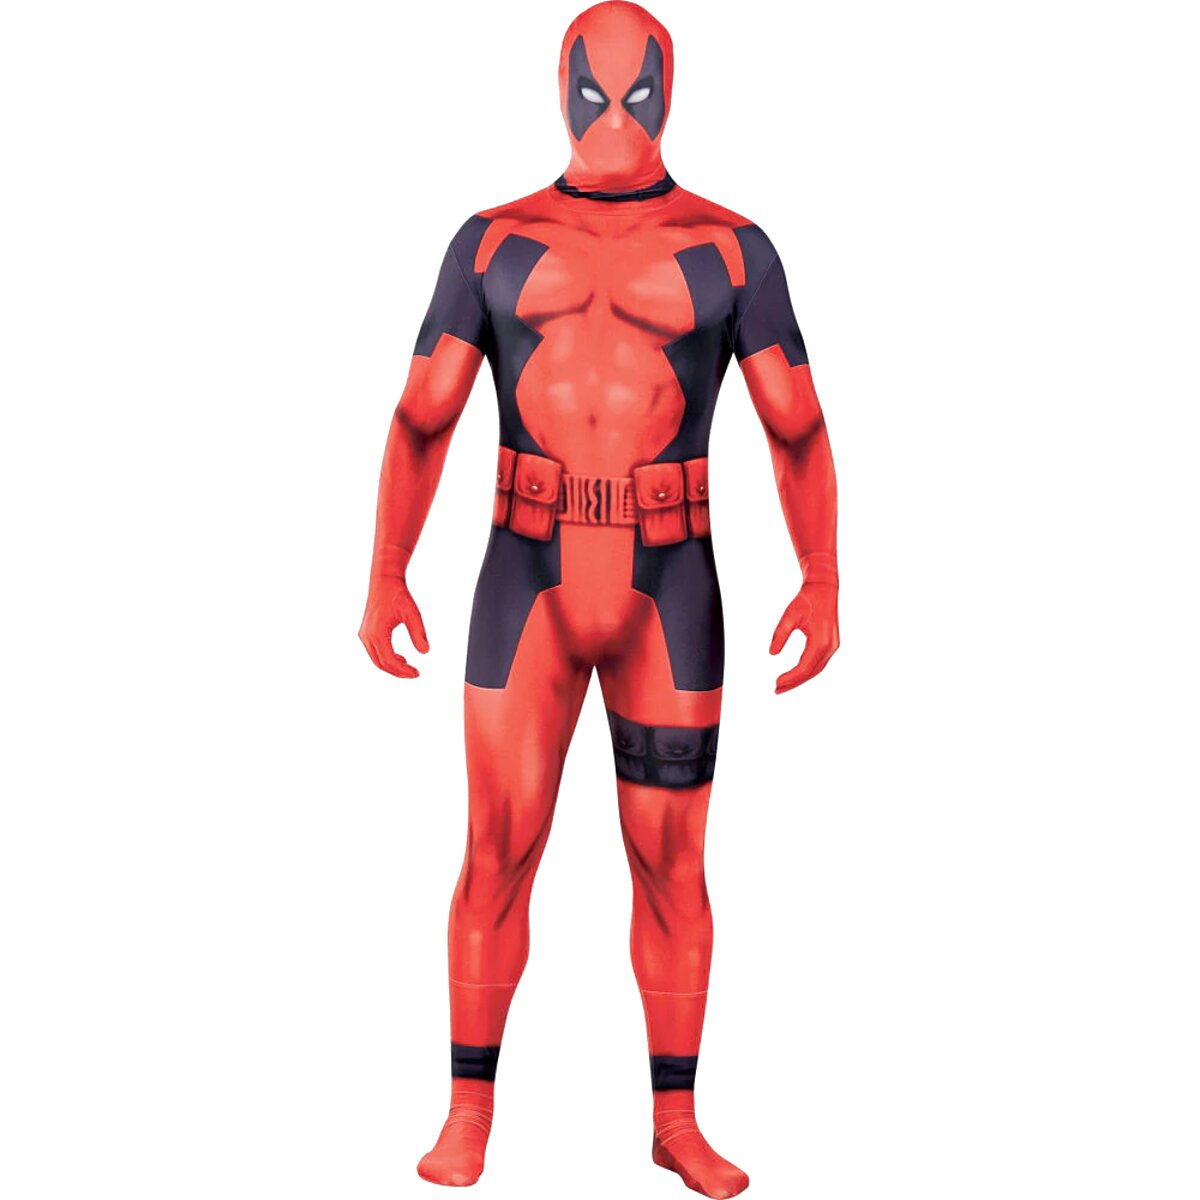 DEADPOOL Maschera Cosplay Halloween Costume Lycra Spandex Maschera Adulto Rosso//Nero Taglie